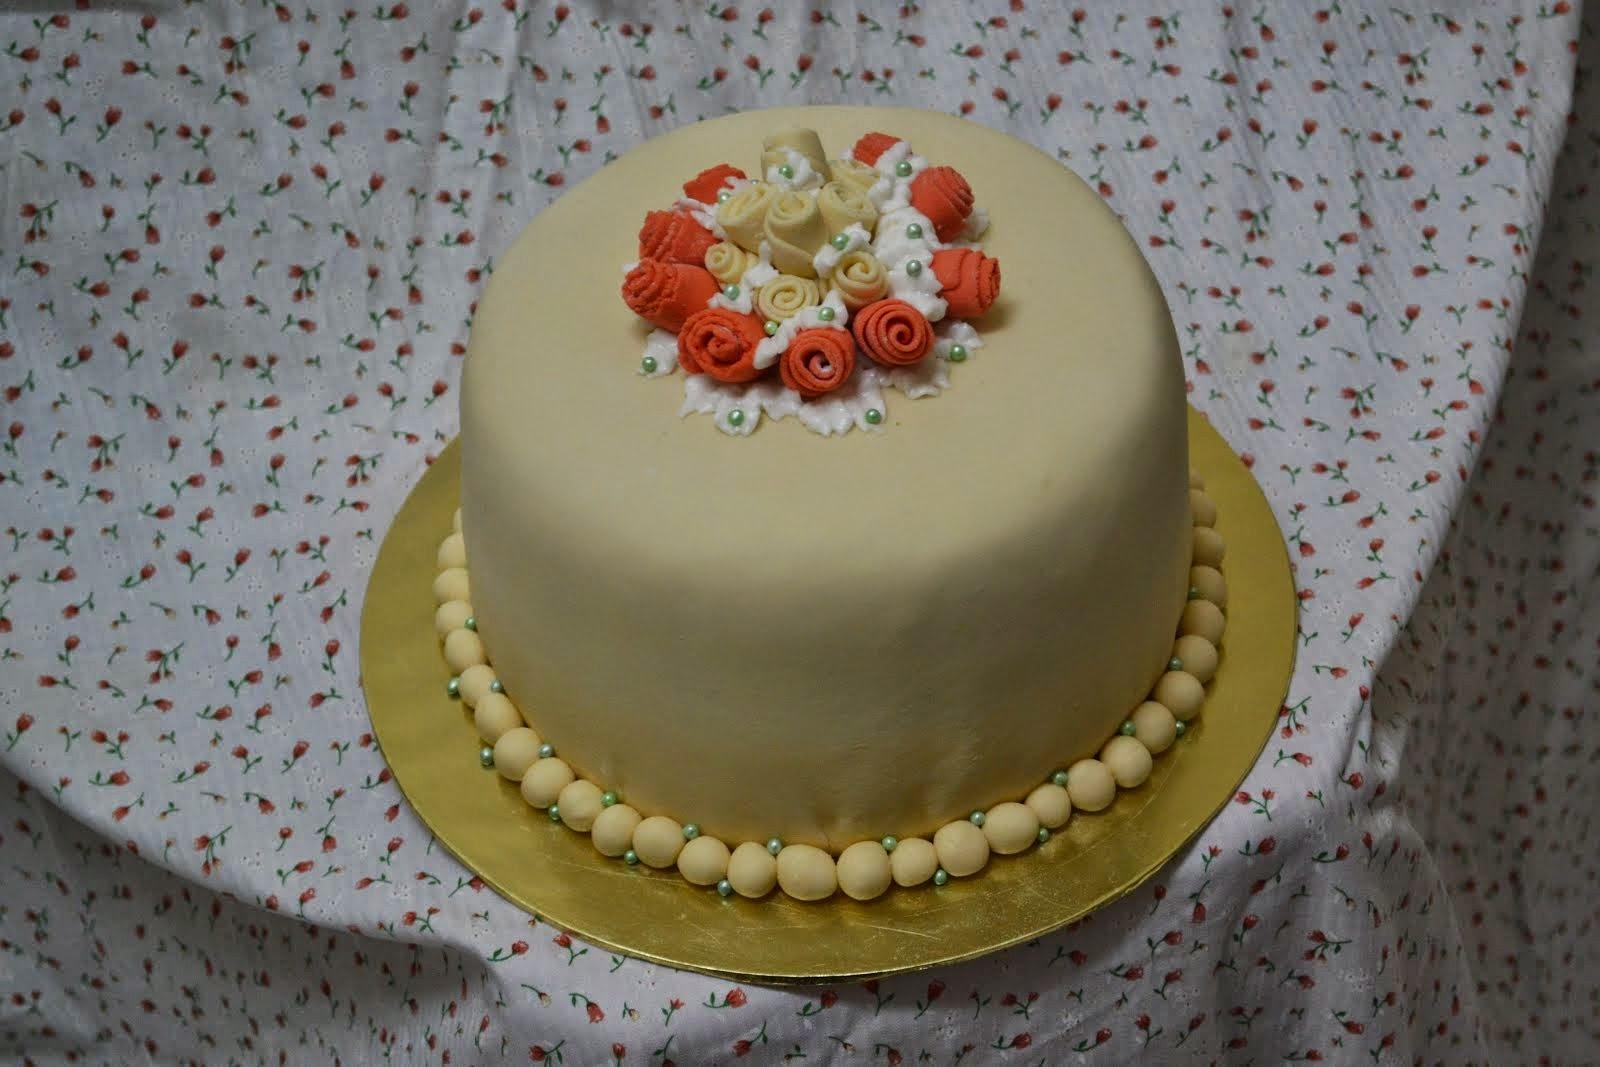 My Pastel cake